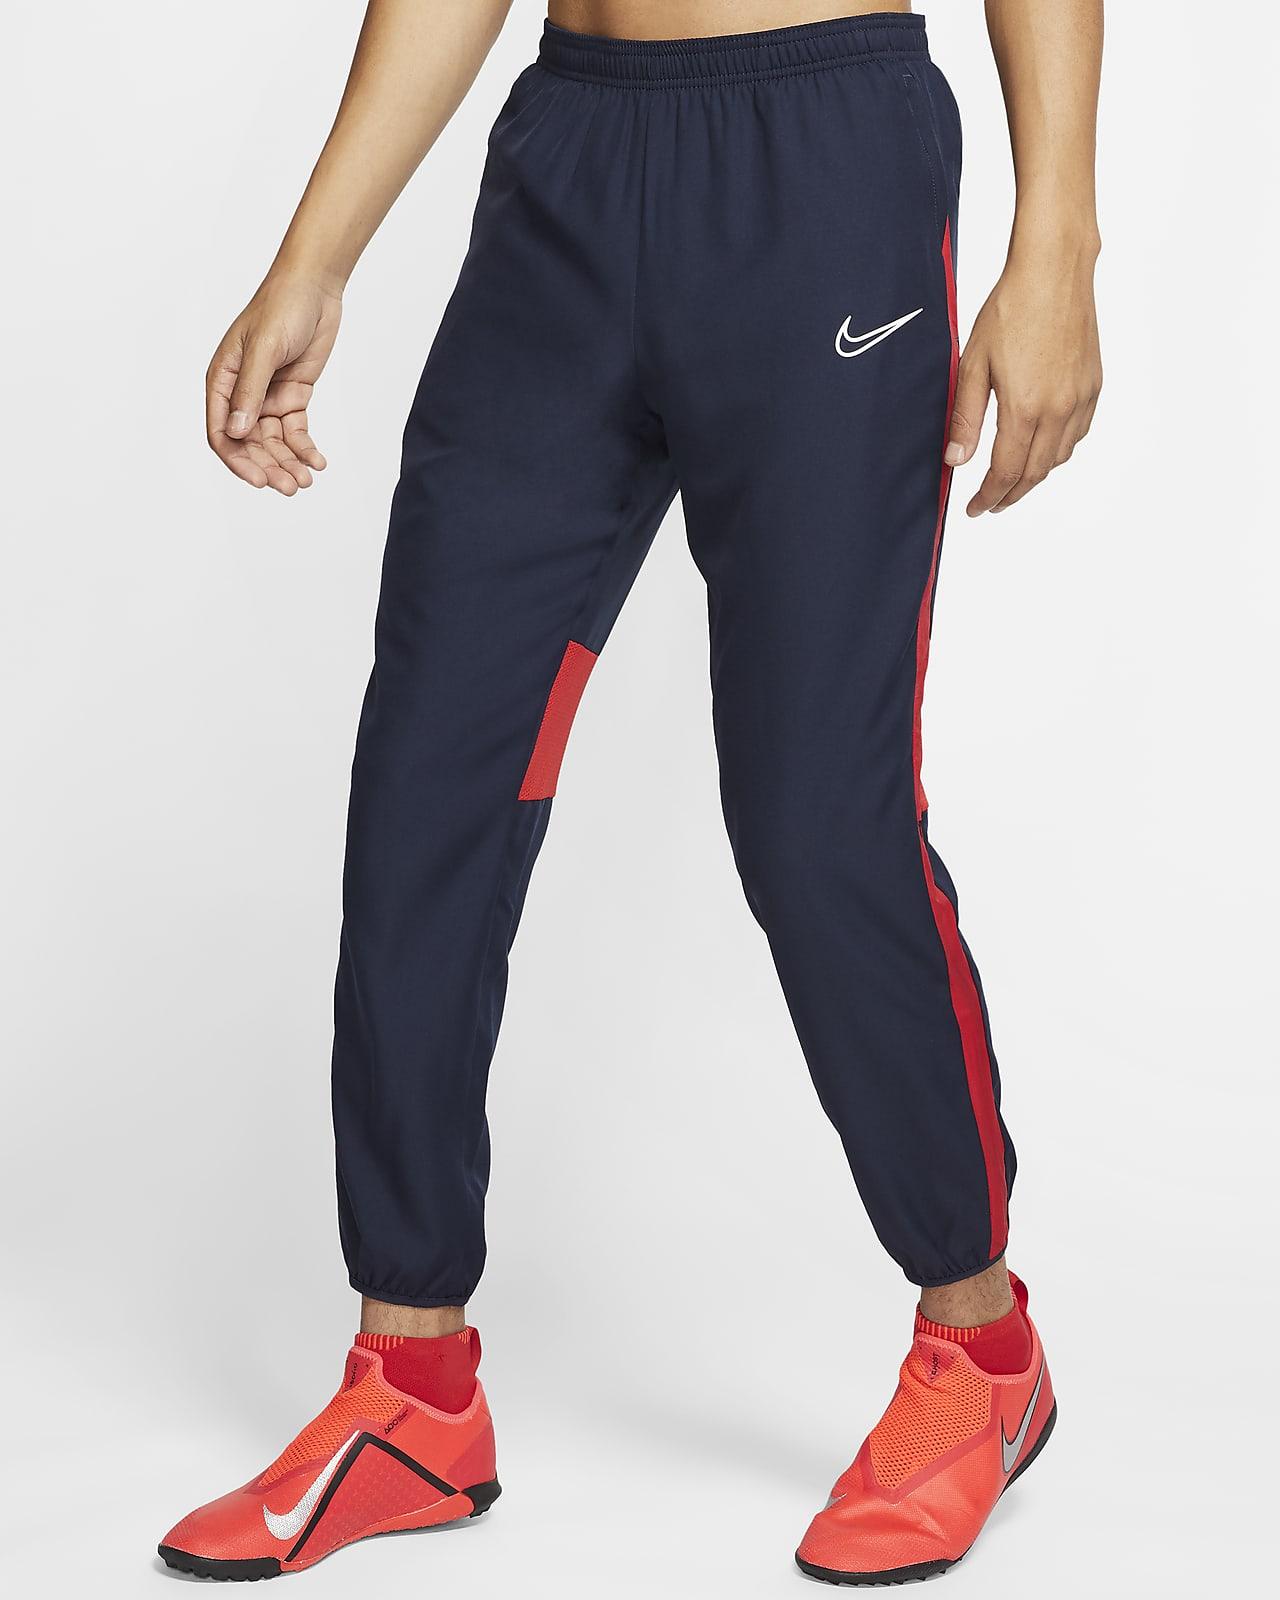 Pantalones de fútbol ajustables para hombre Nike Dri-FIT Academy